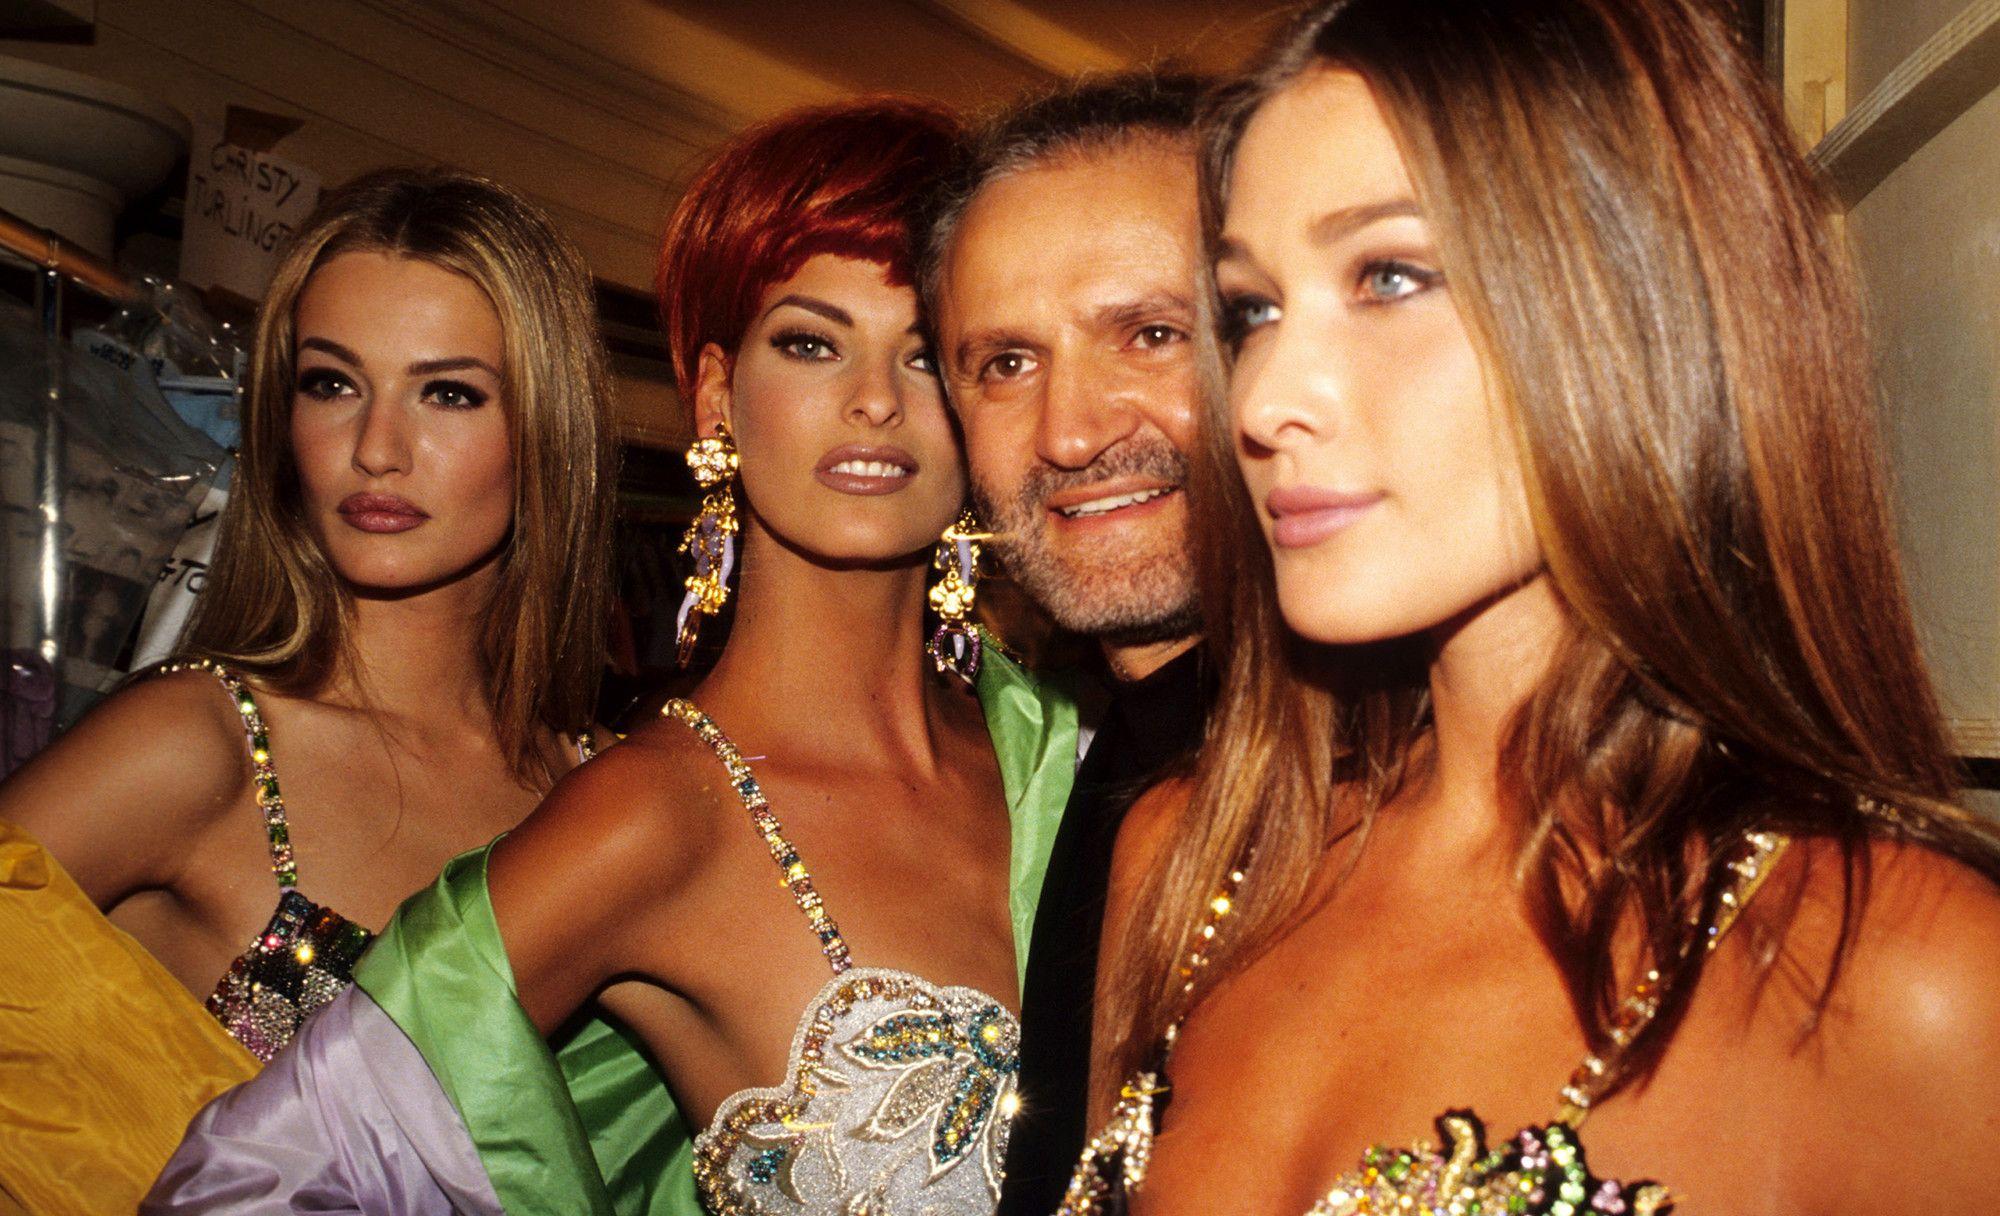 The True Story of Gianni Versace's Murder